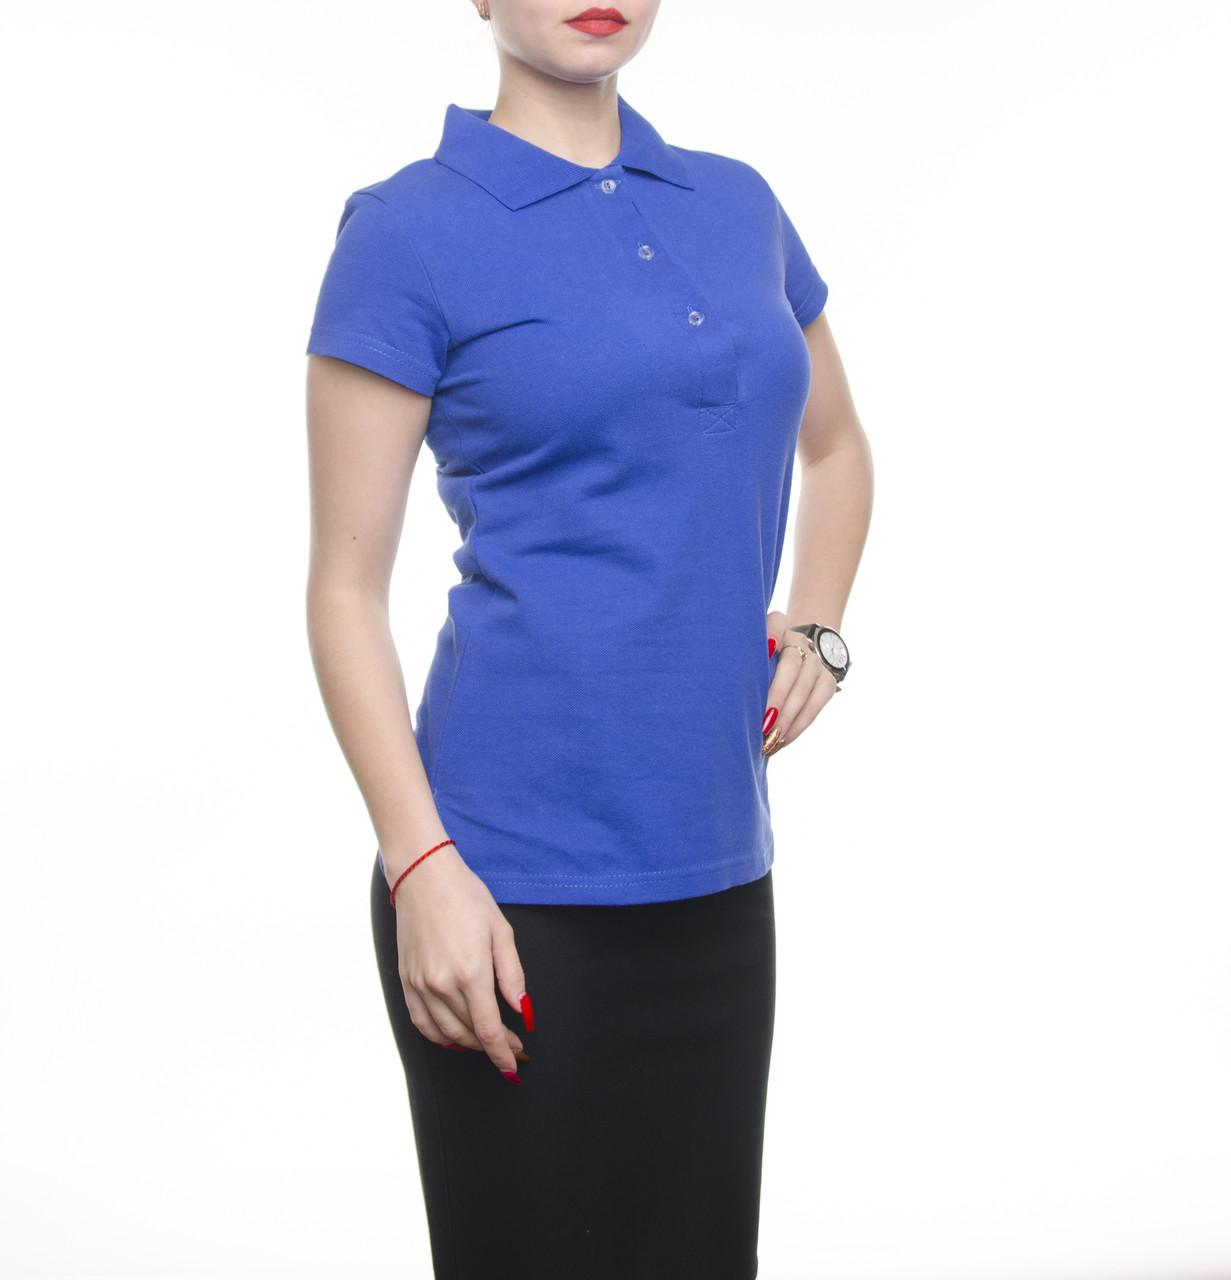 Bono Женская футболка Поло синий электрик 400127